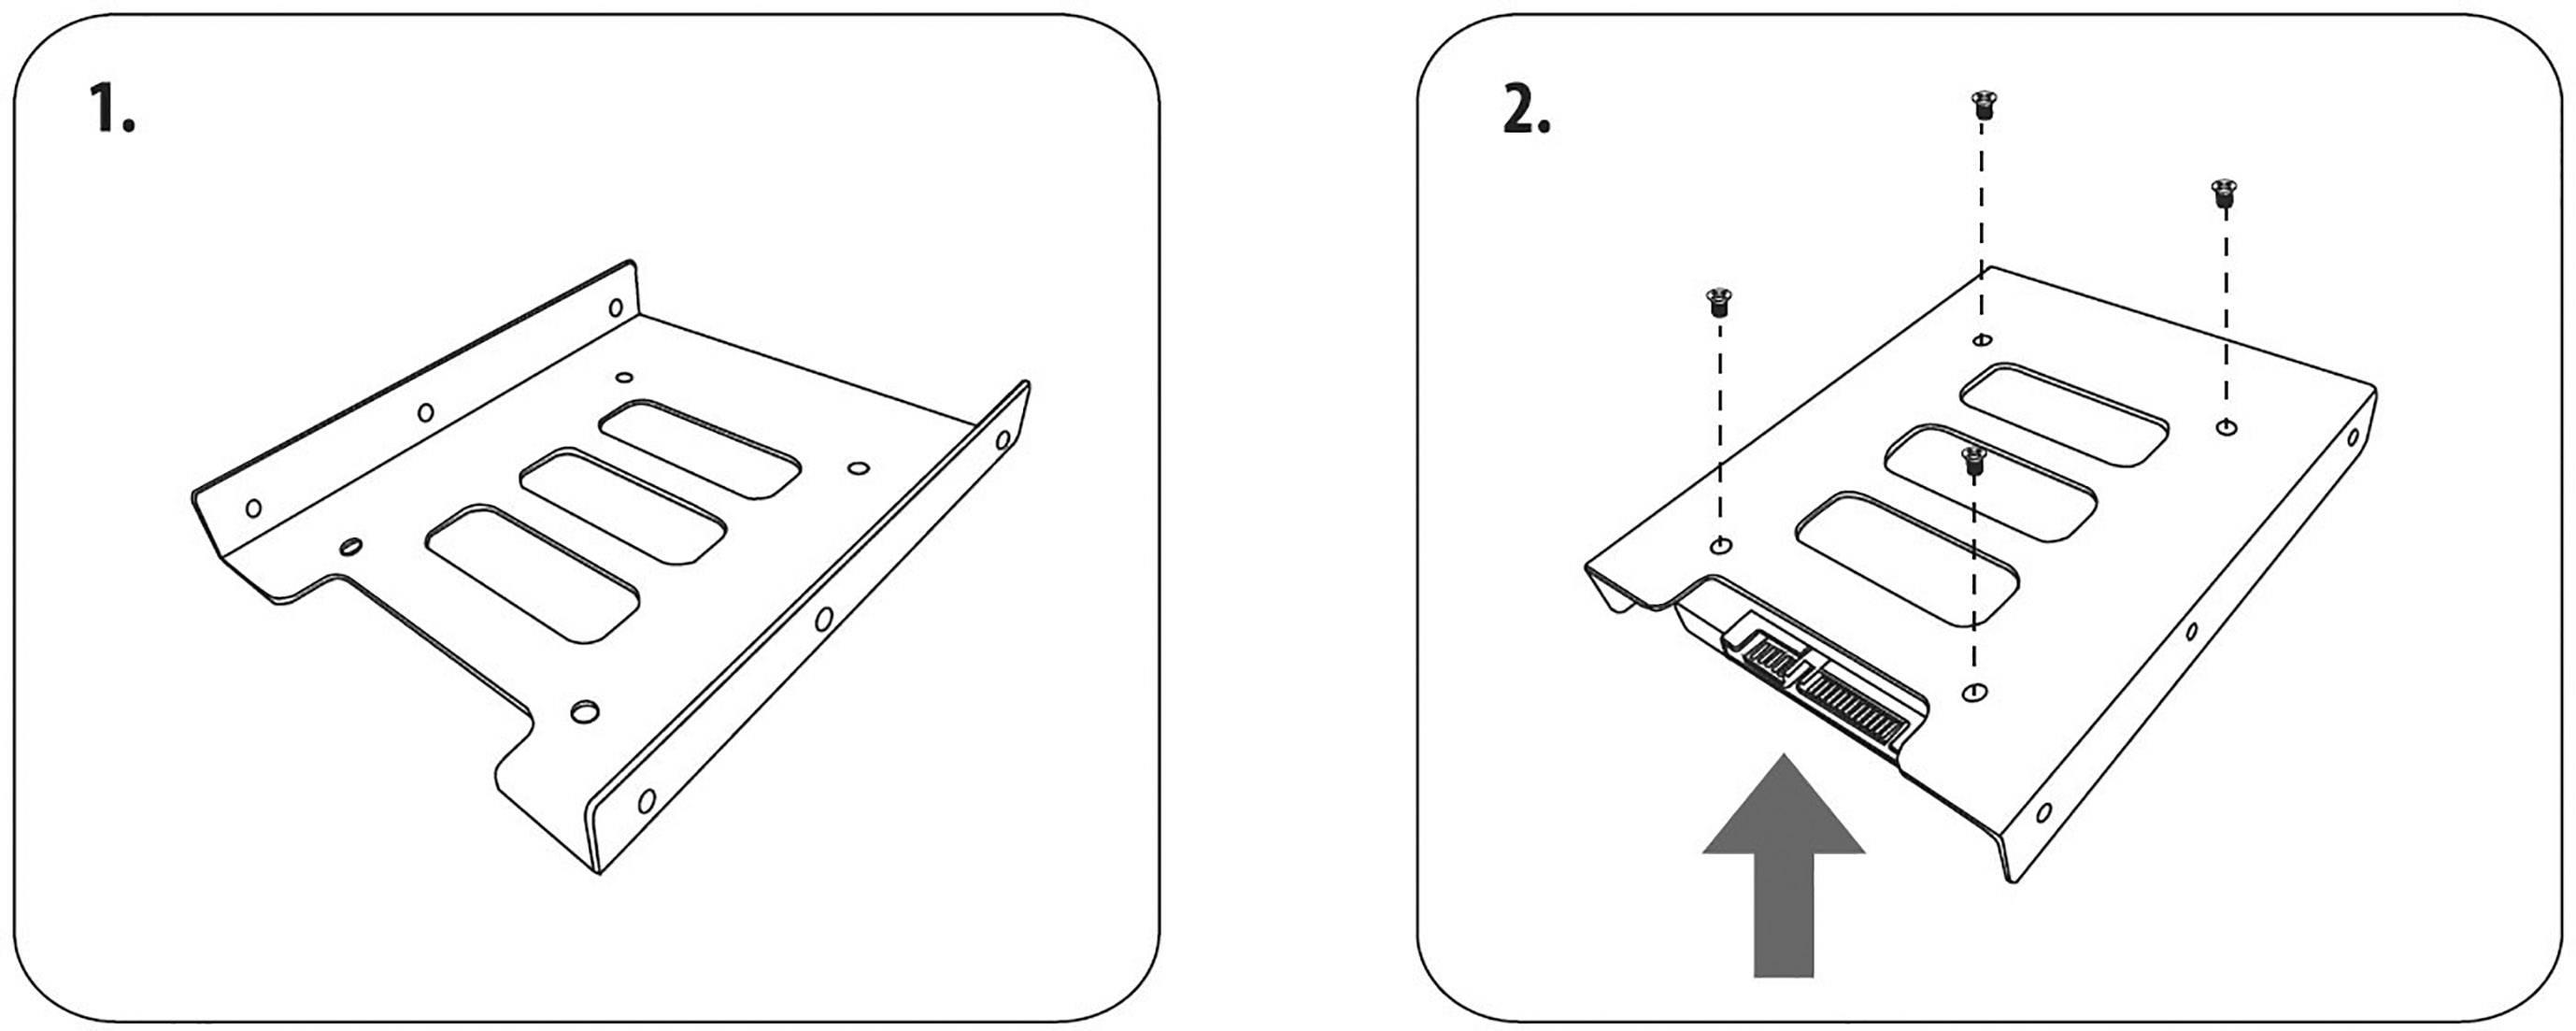 "Adaptér pre uístění 2,5"" pevného disku do 3,5"" pozície Renkforce HDA-250M"